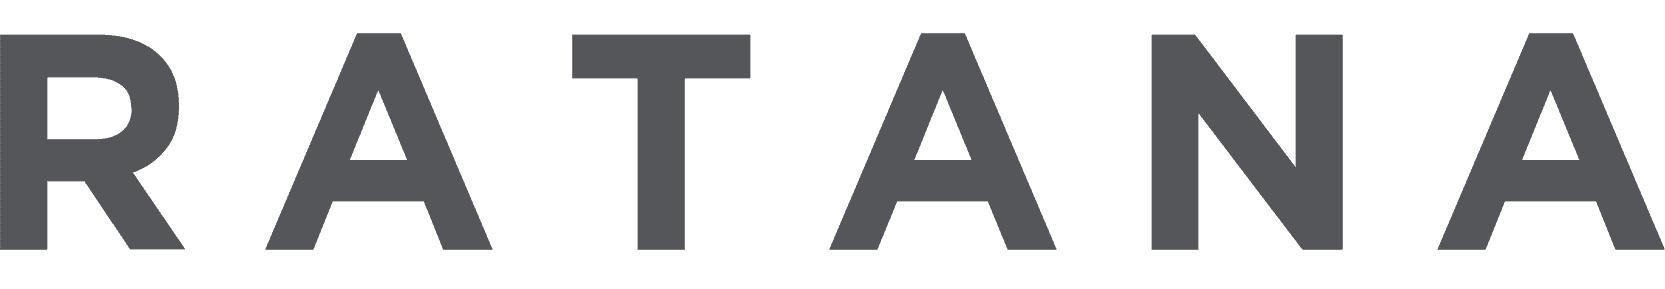 Ratana Logo